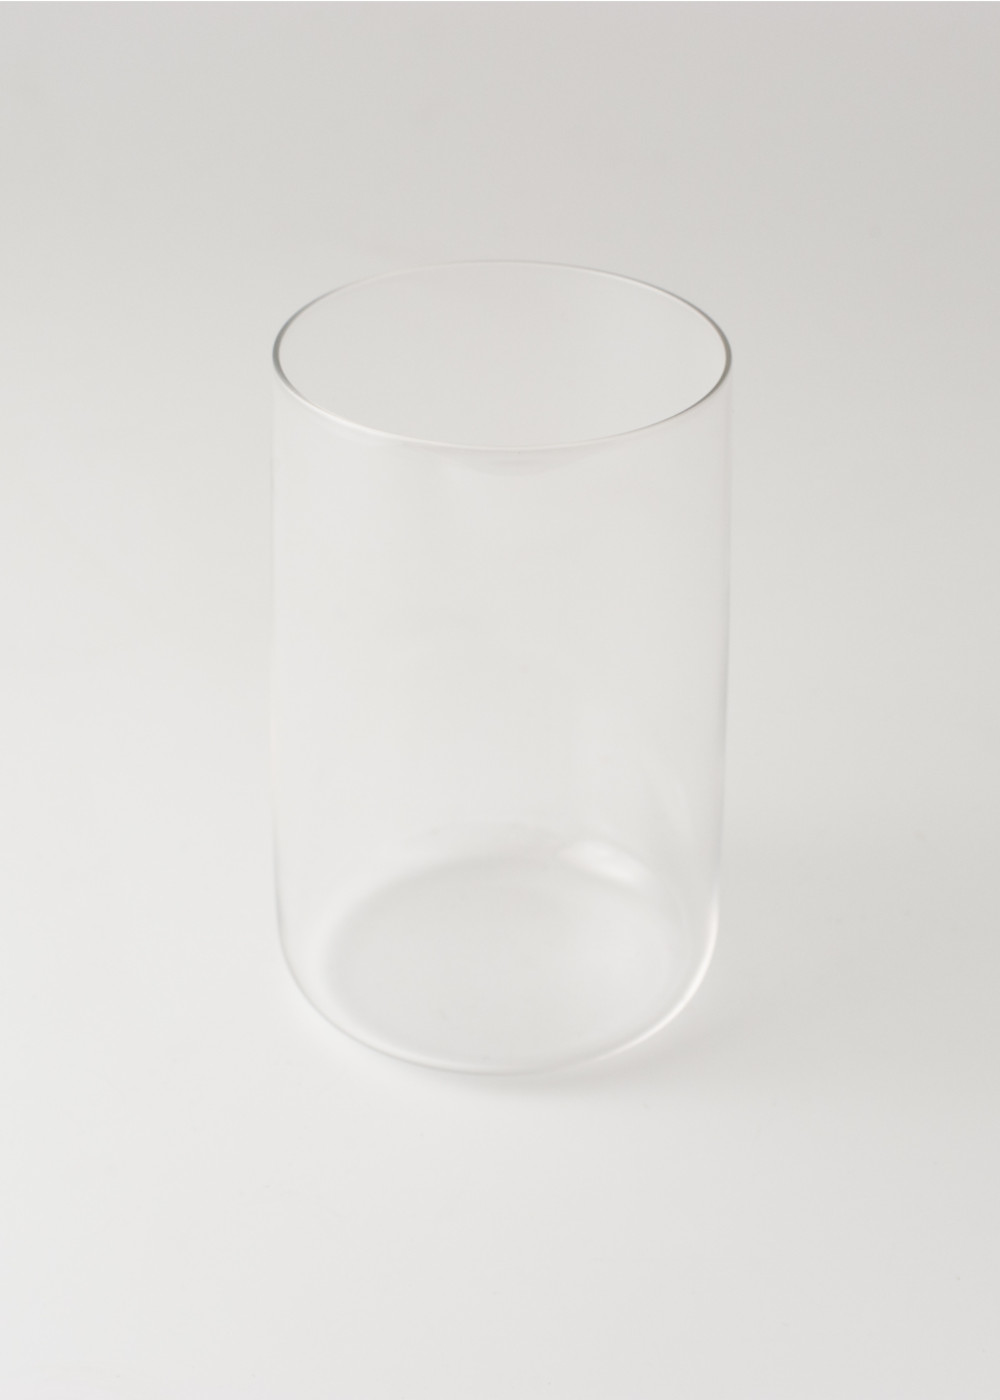 AndosGlass-Tall